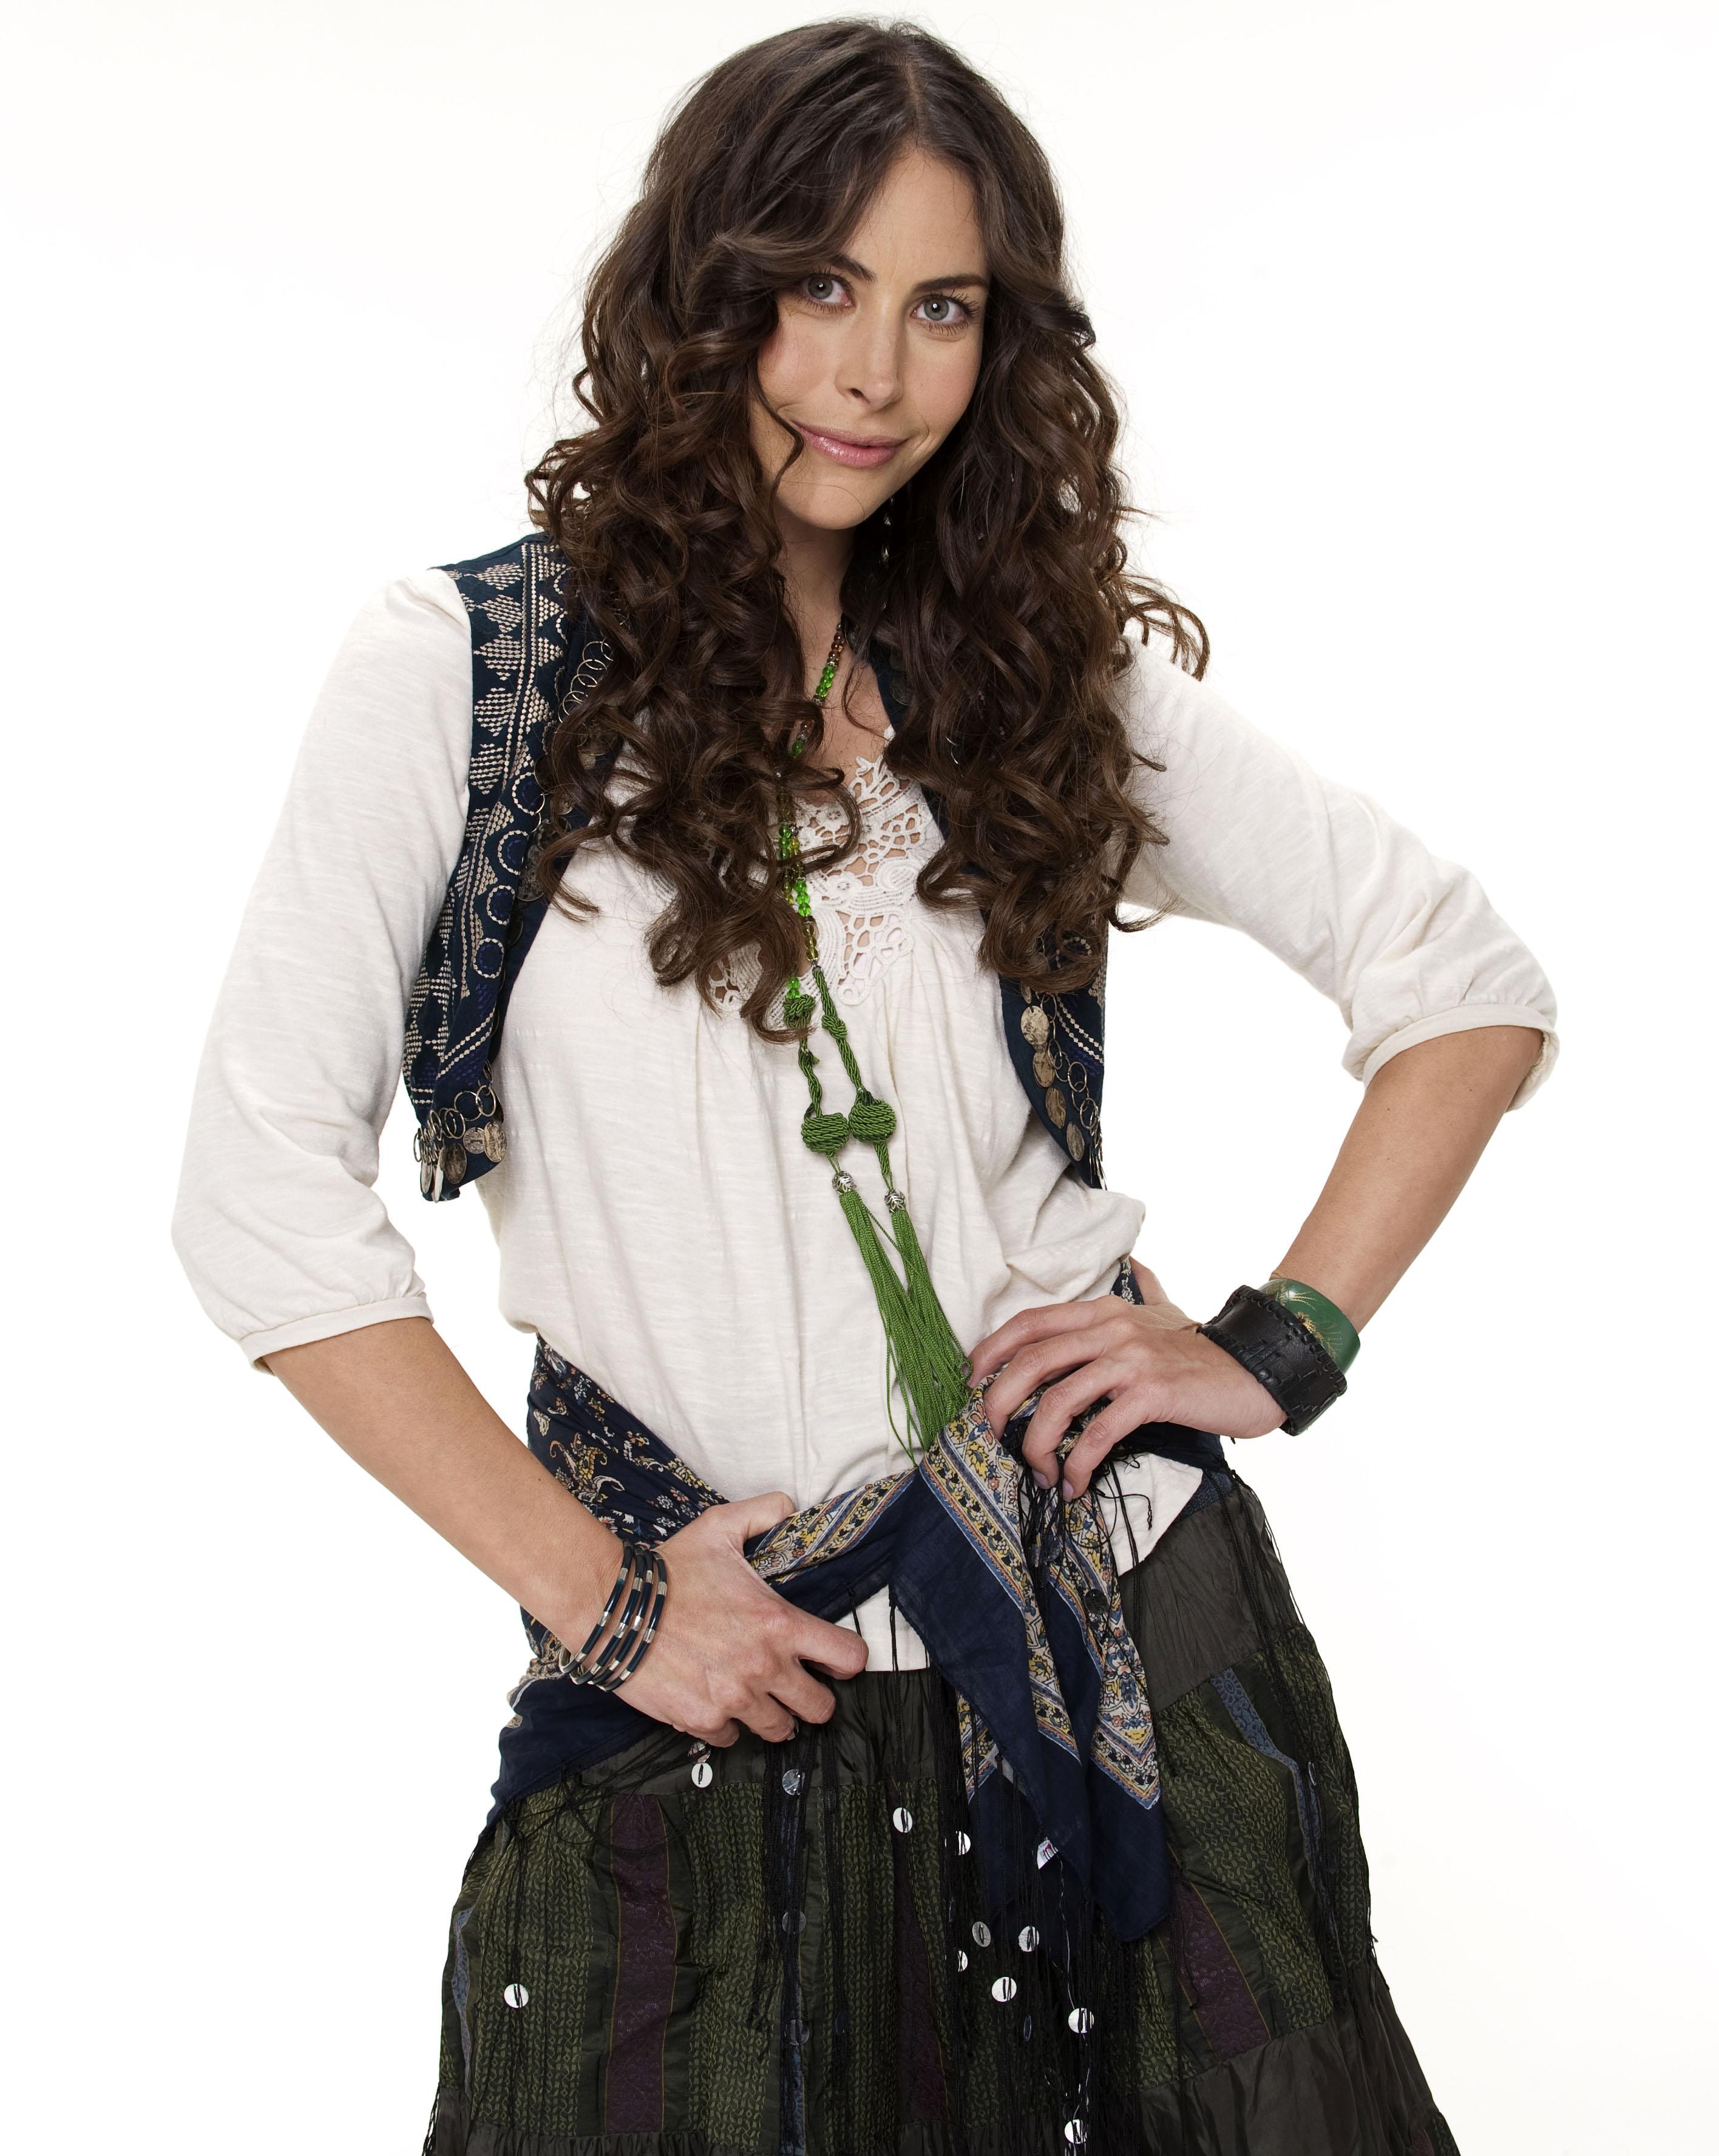 Vanessa Guzman